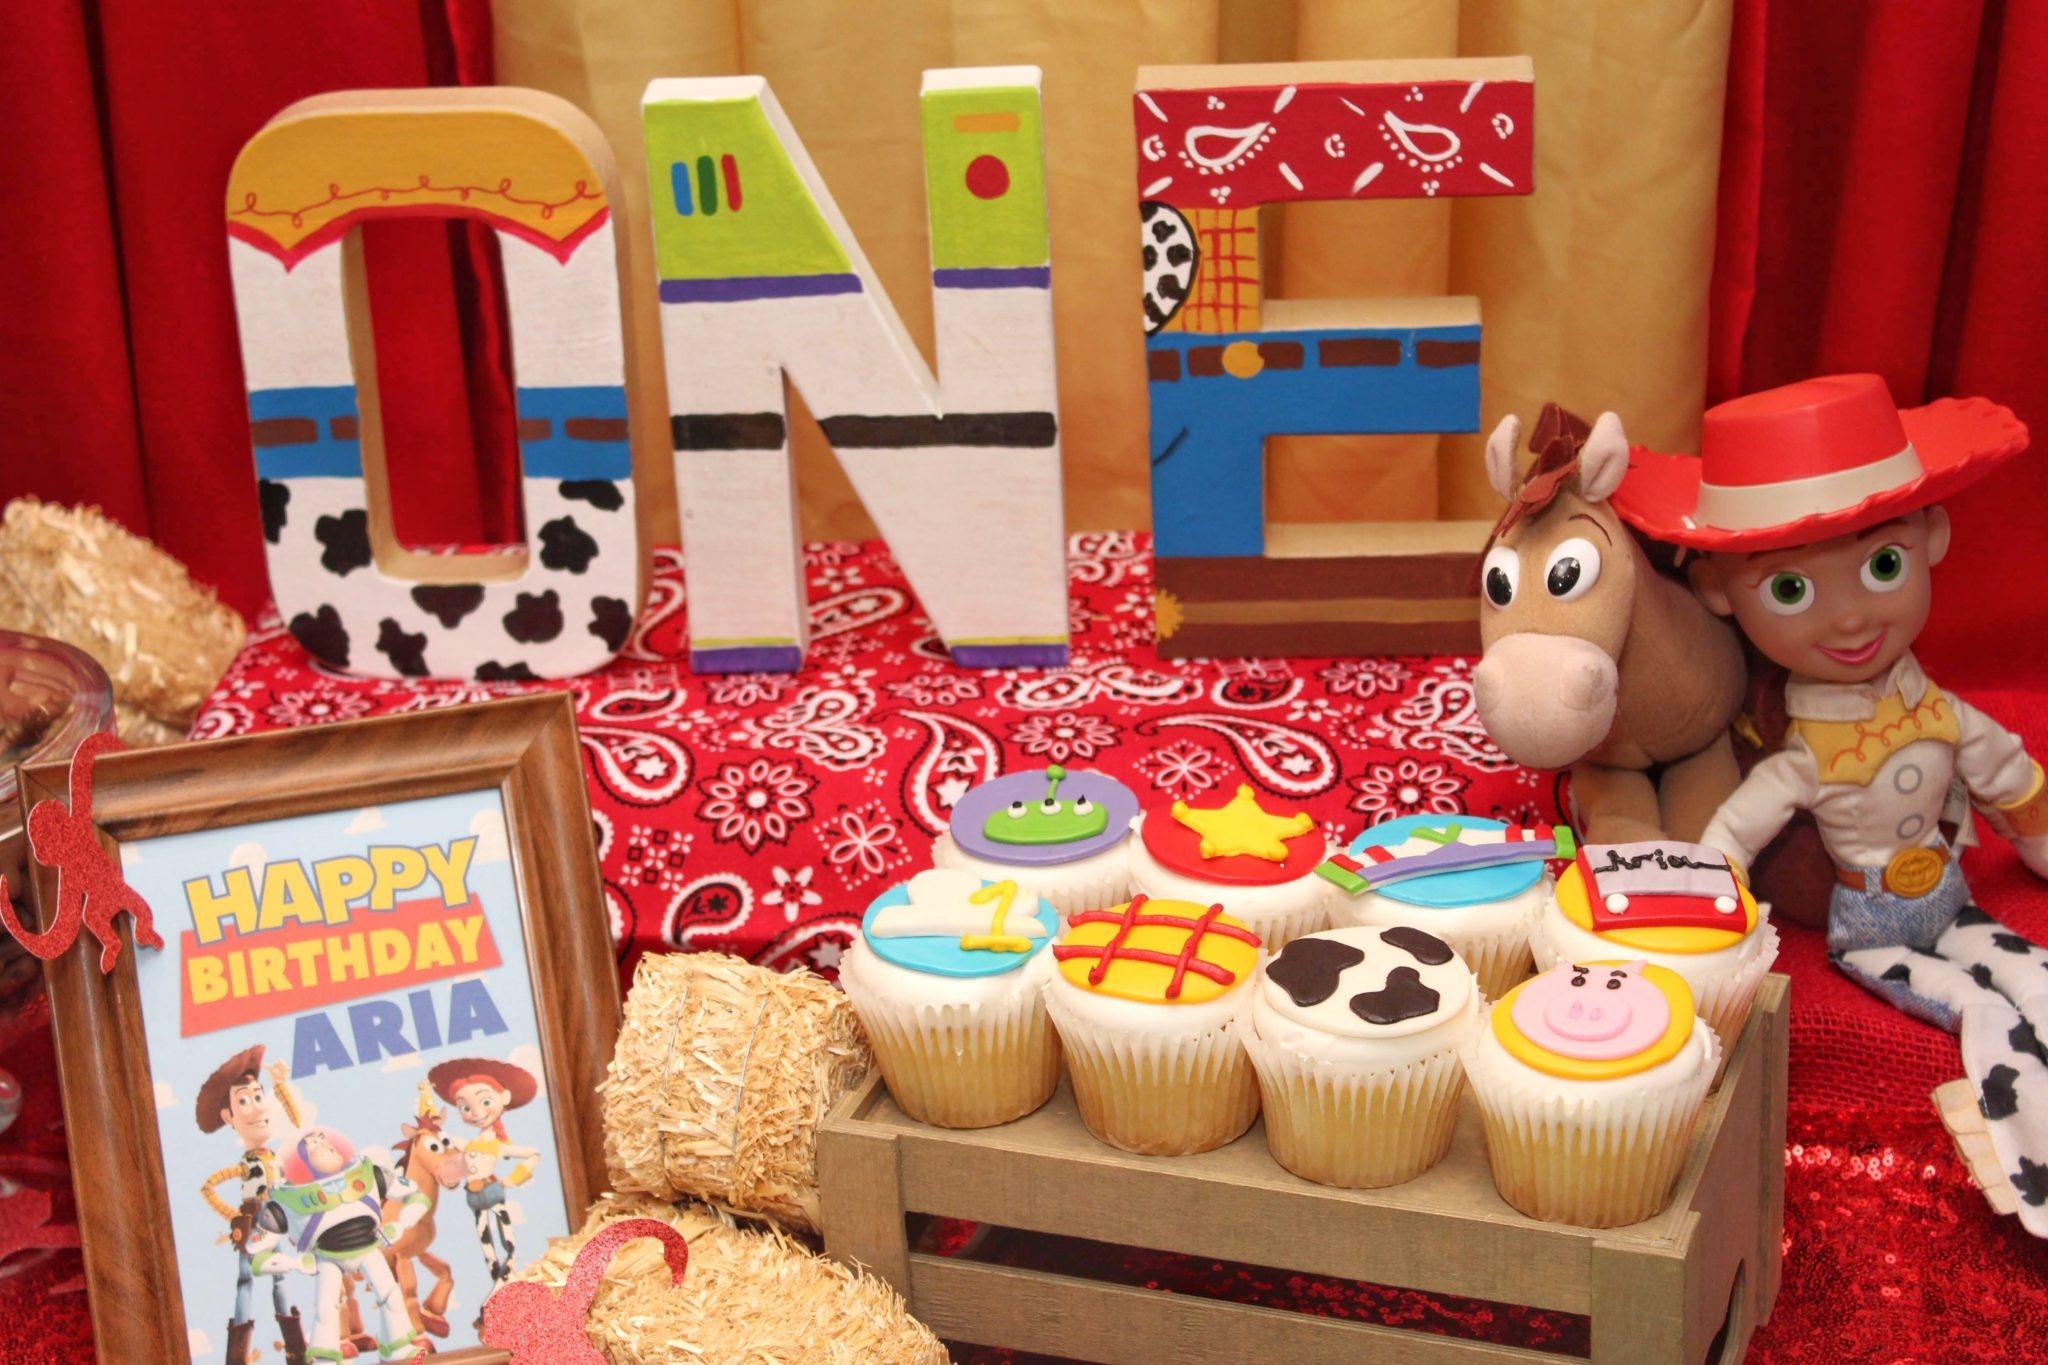 Aria's First Birthday: Toy Story Birthday Party Ideas + Free Printables - Toy Story Birthday Card Printable Free